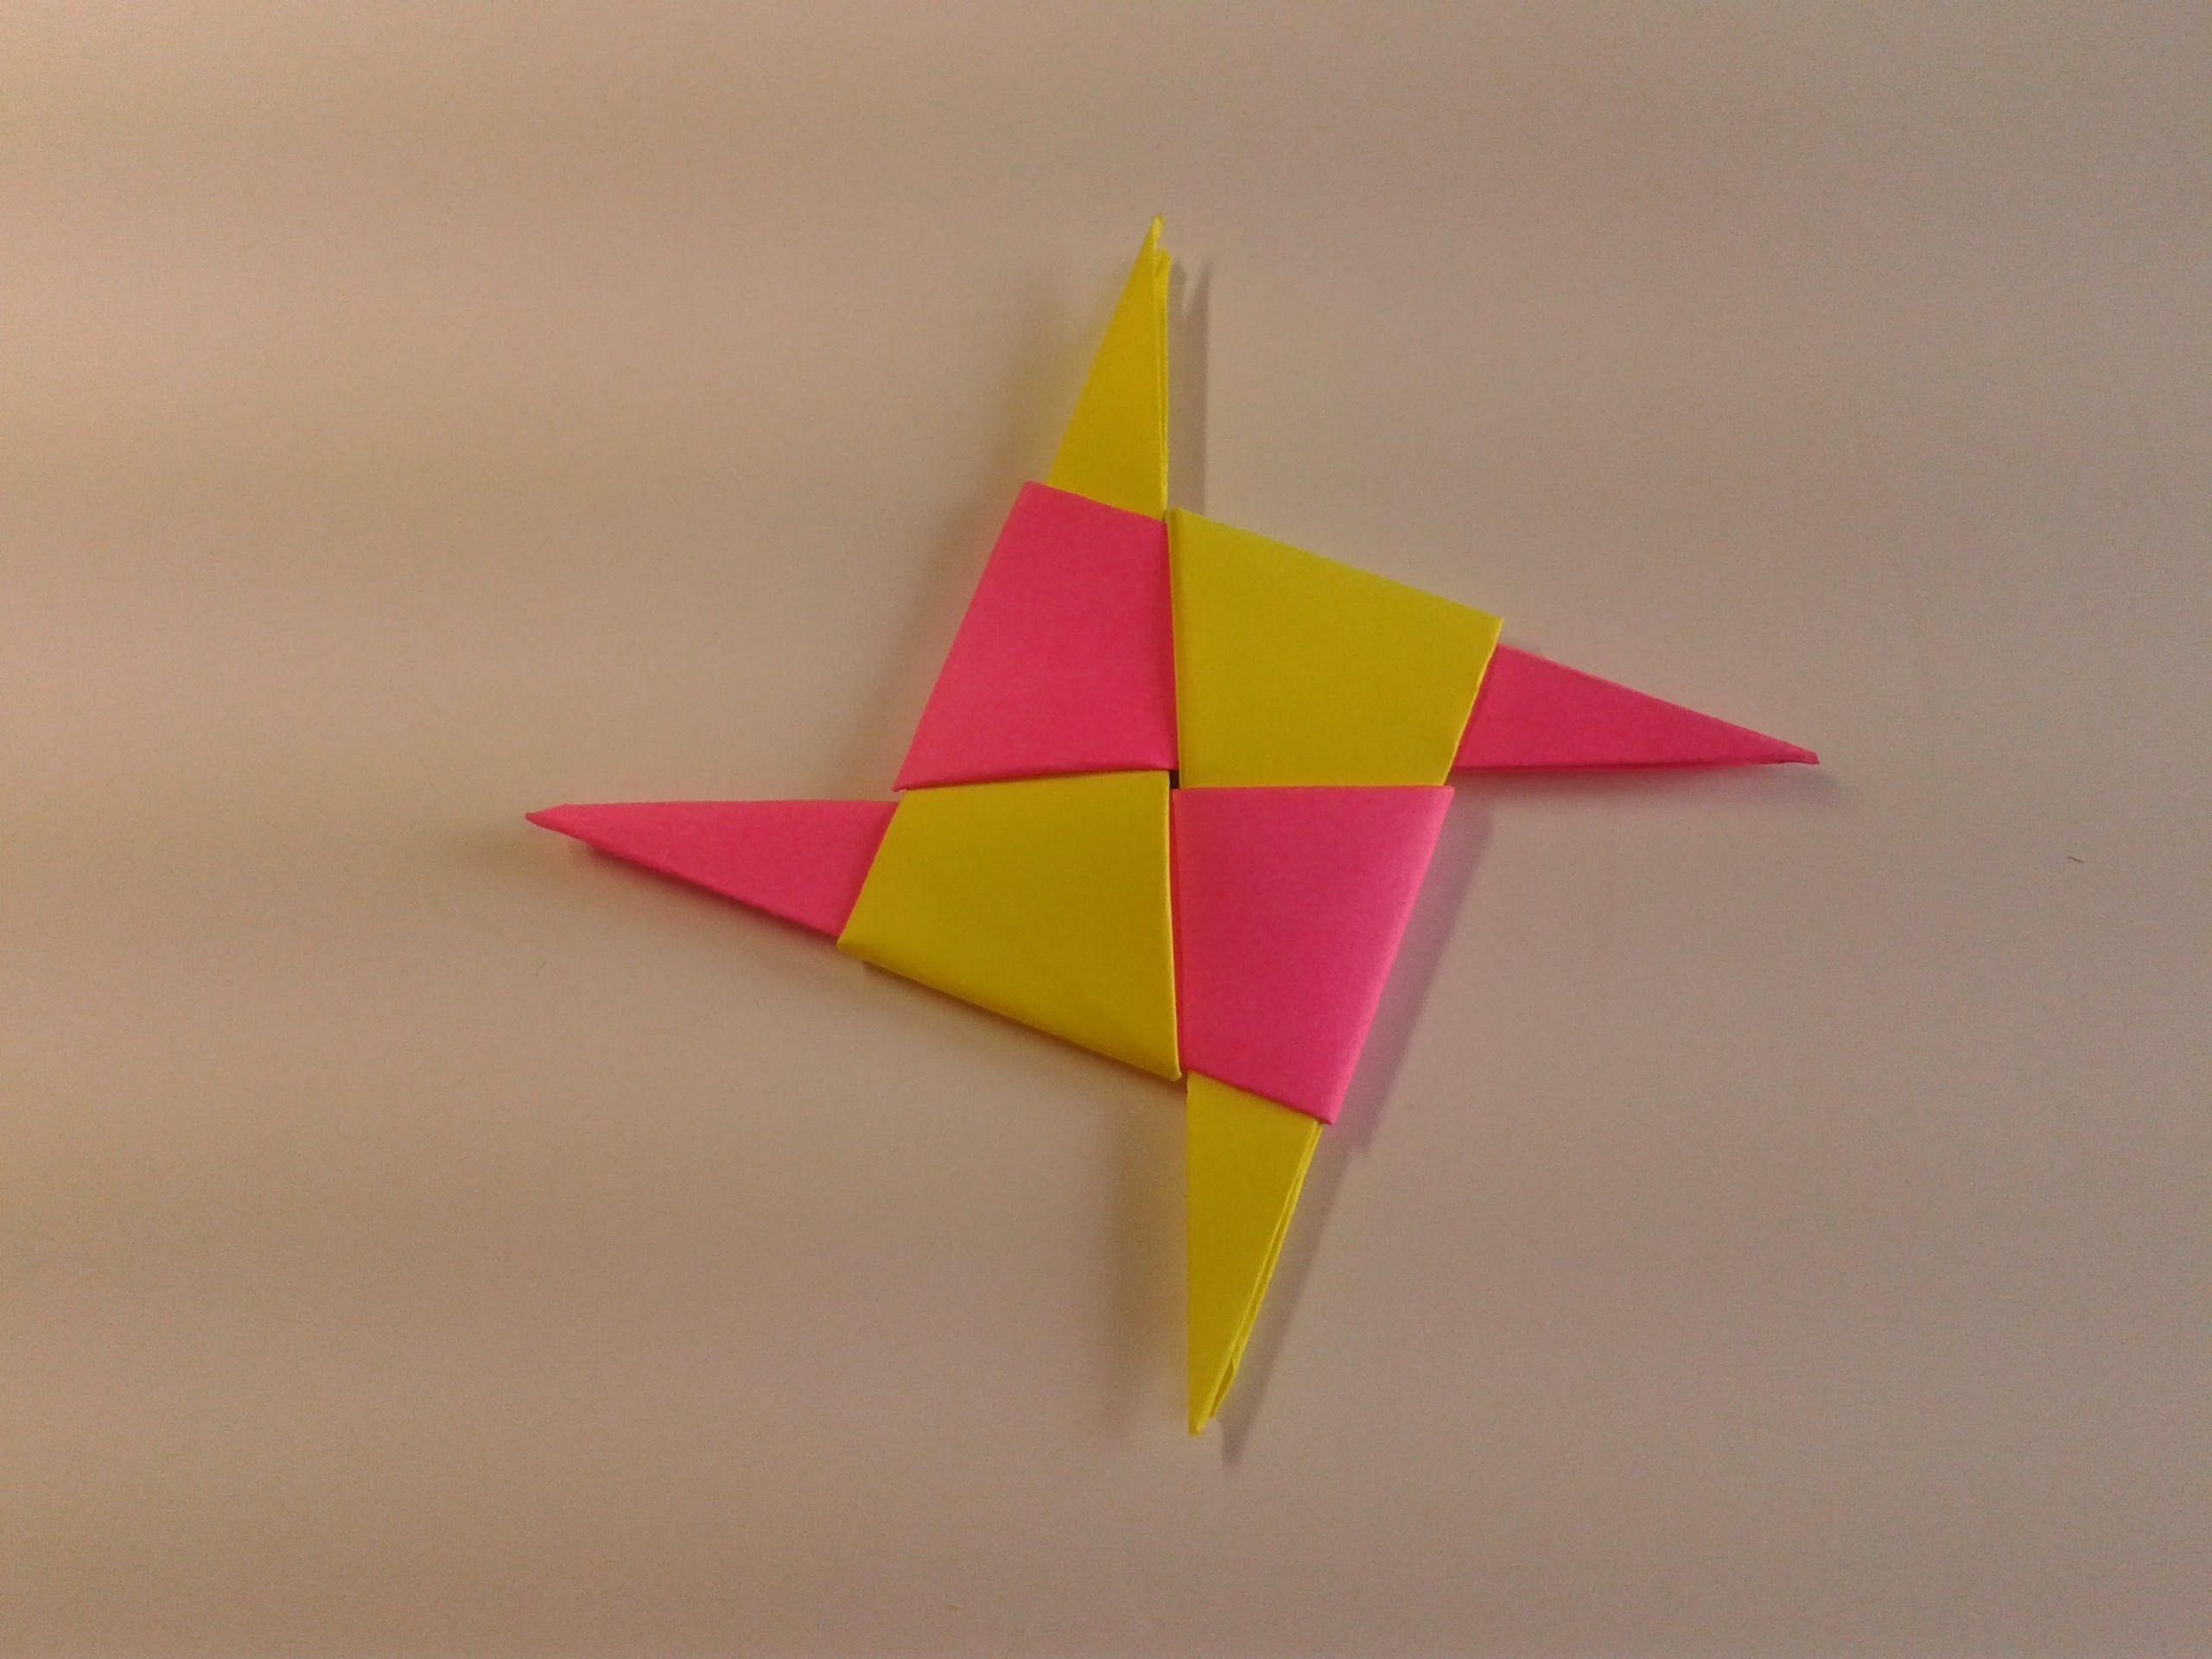 How To Make A Paper Ninja Star Origami Hajtogats Origami Videk